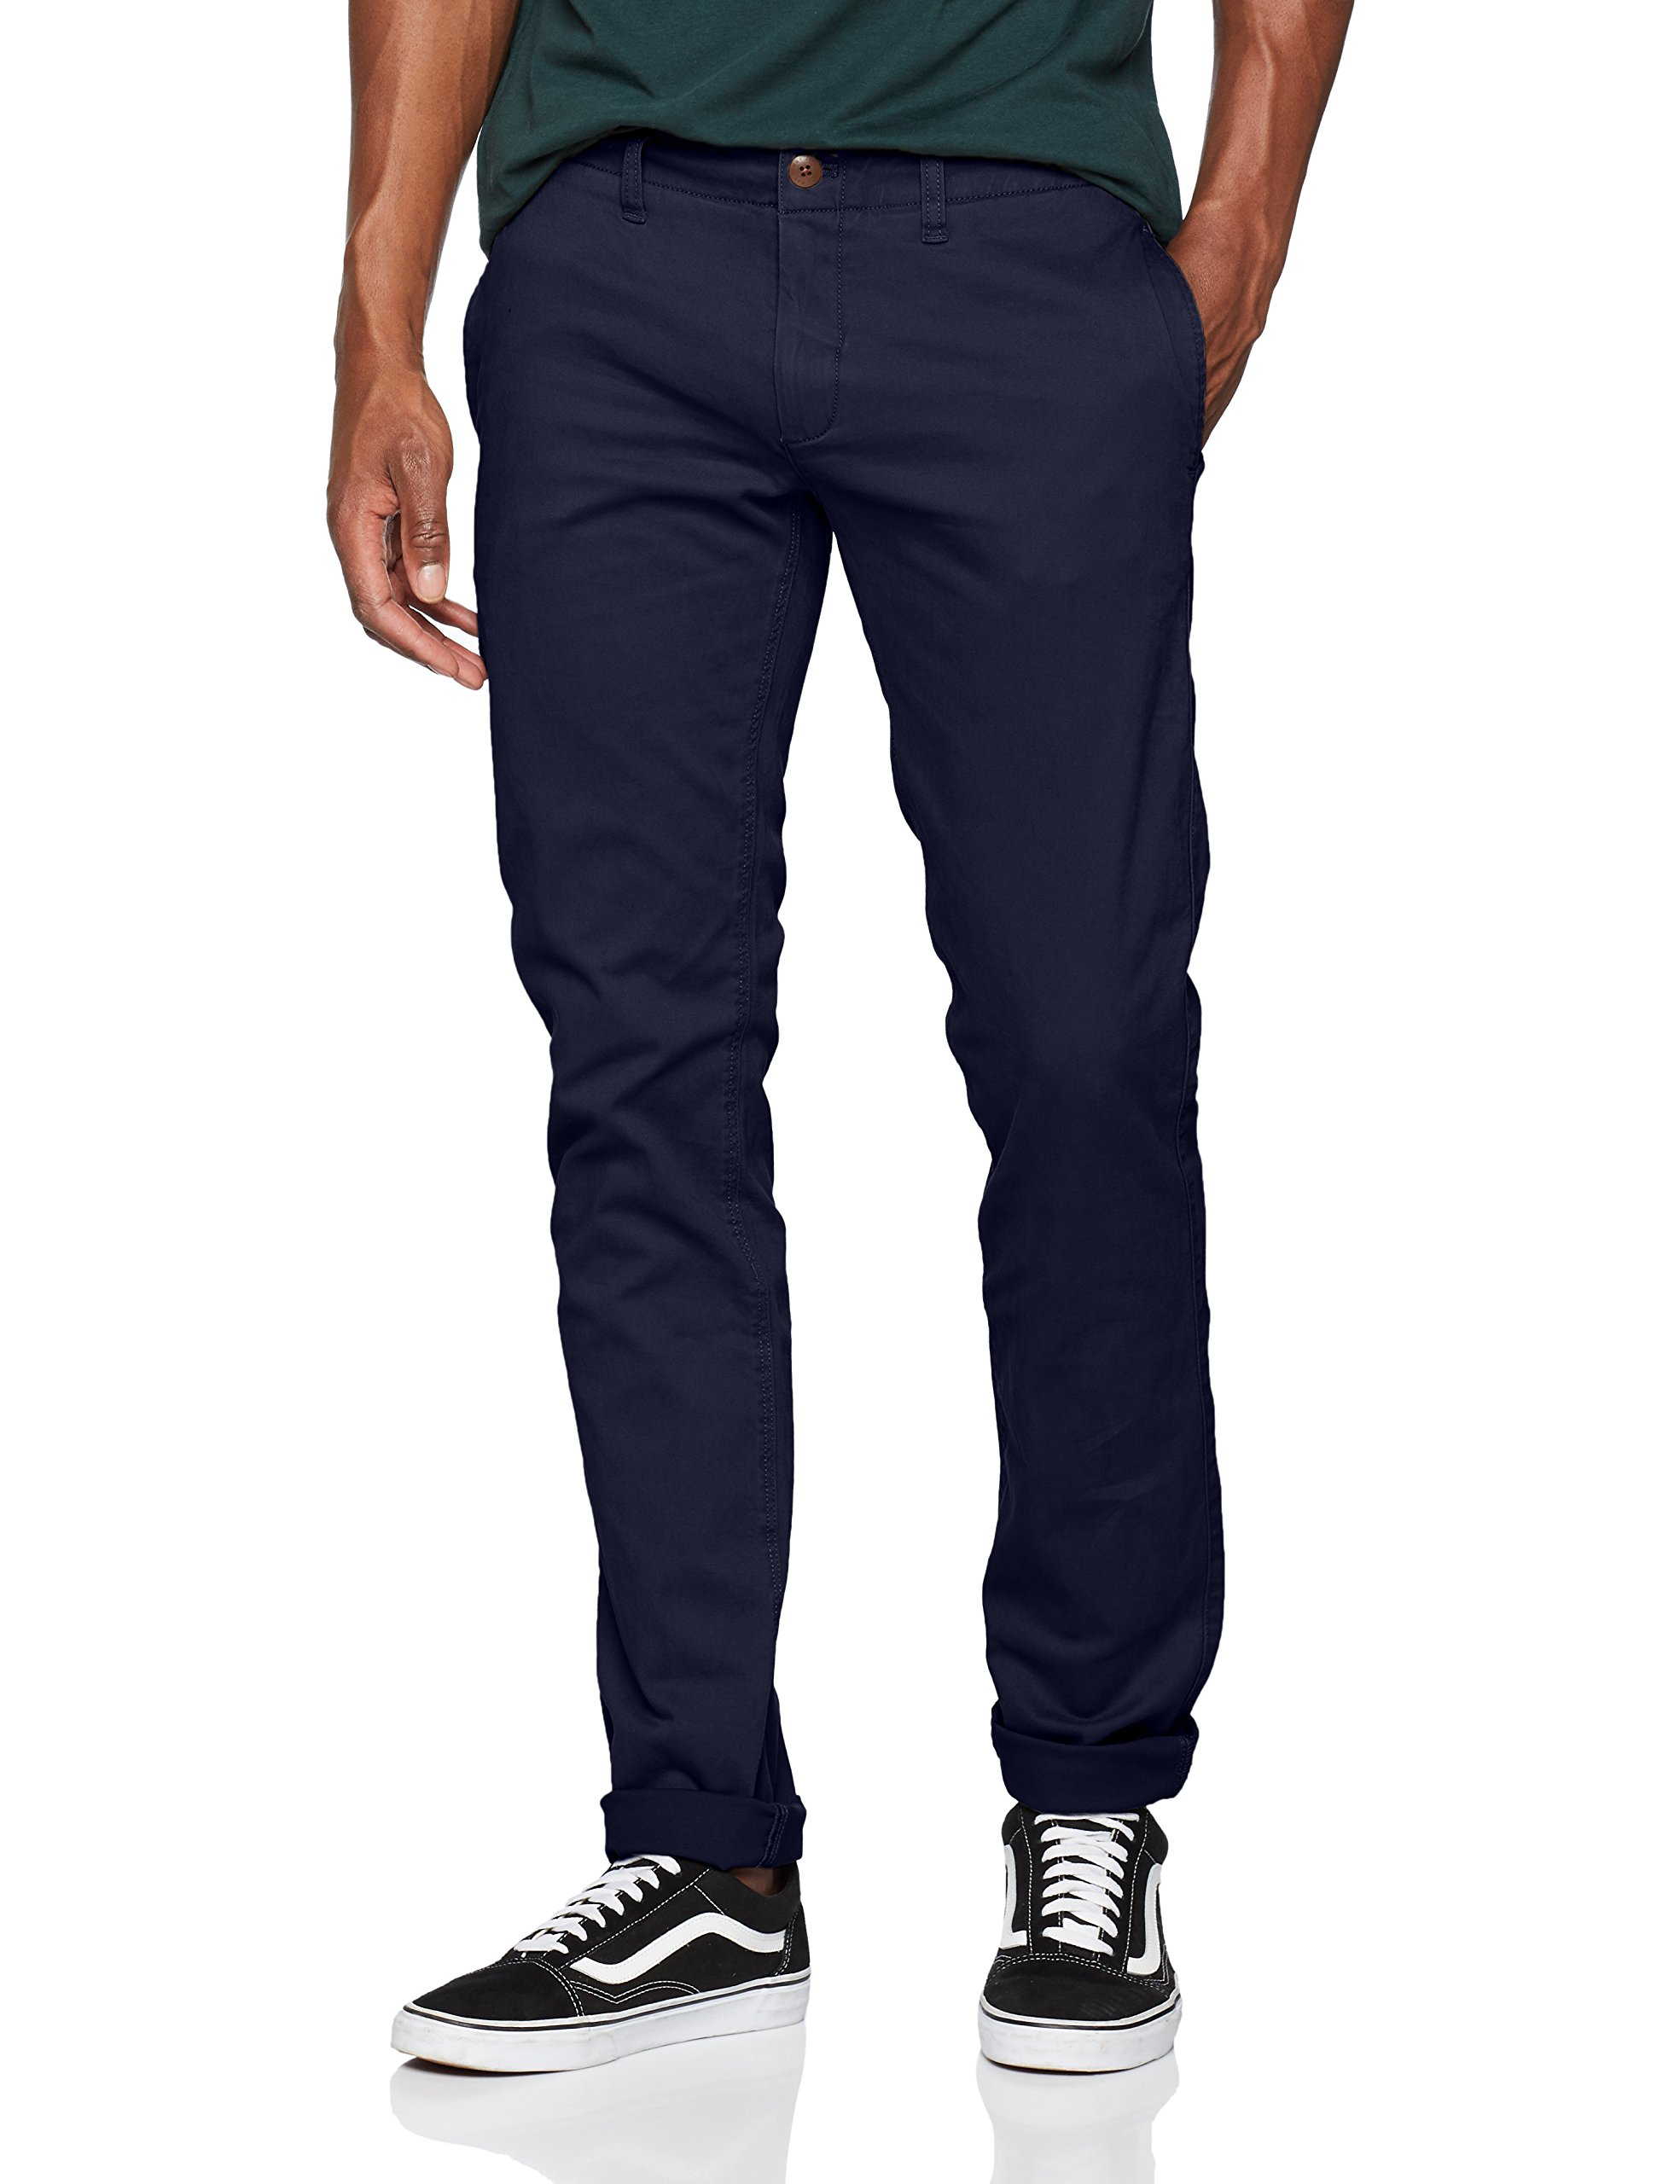 Essential Slim Chino Tommy 002W36 Iris Pantalon Bleublack Homme Jeans l34 eDY9W2EHIb